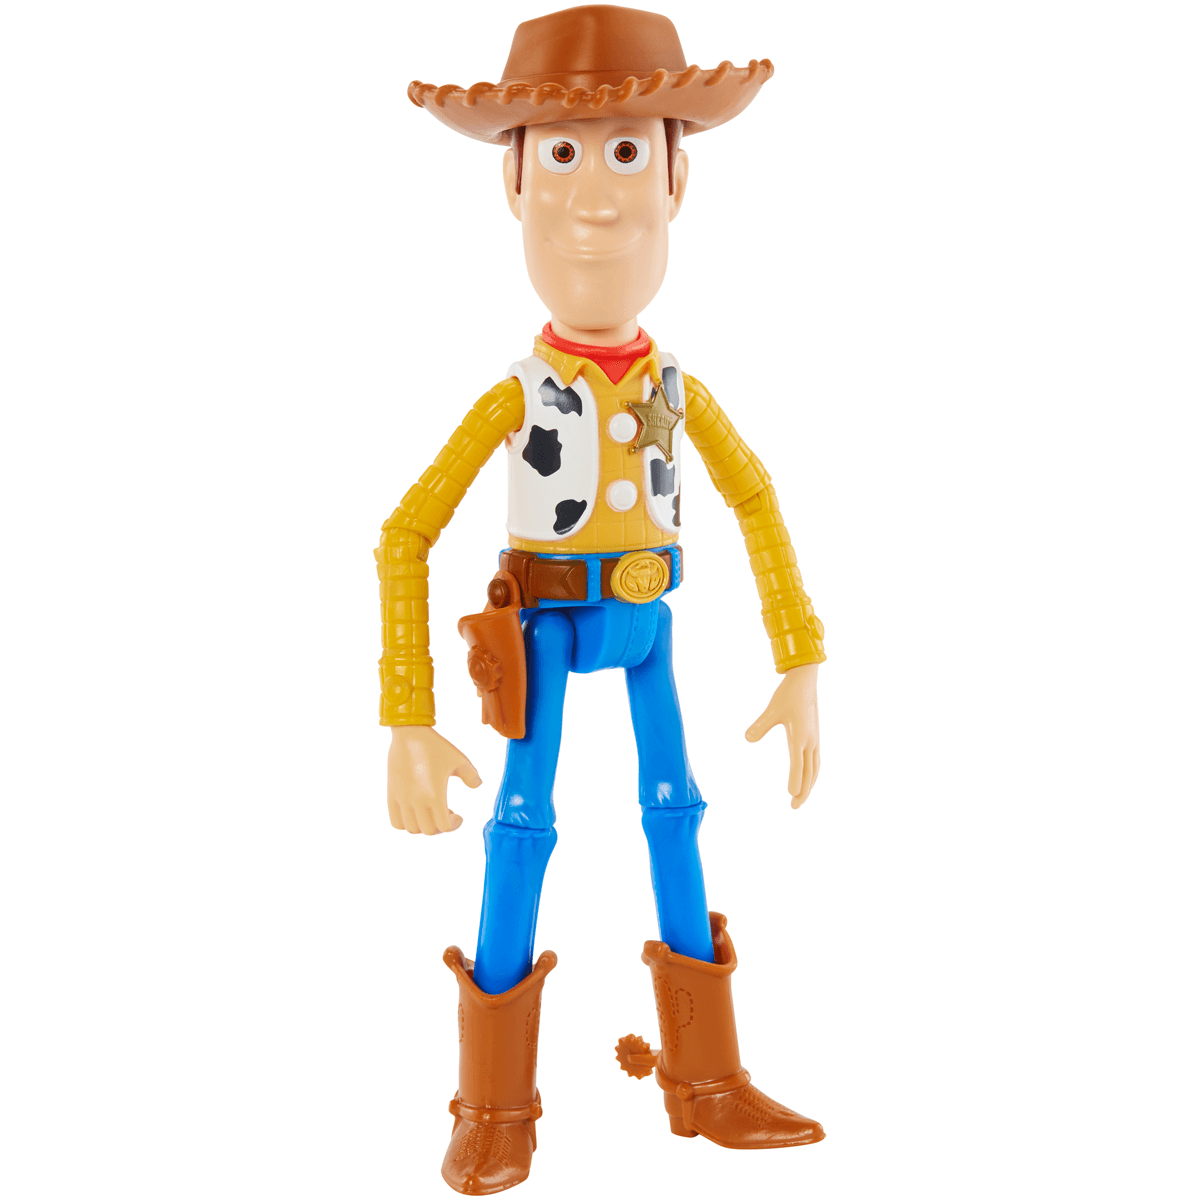 Disney Pixar Toy Story 4 17 cm Figure - Woody